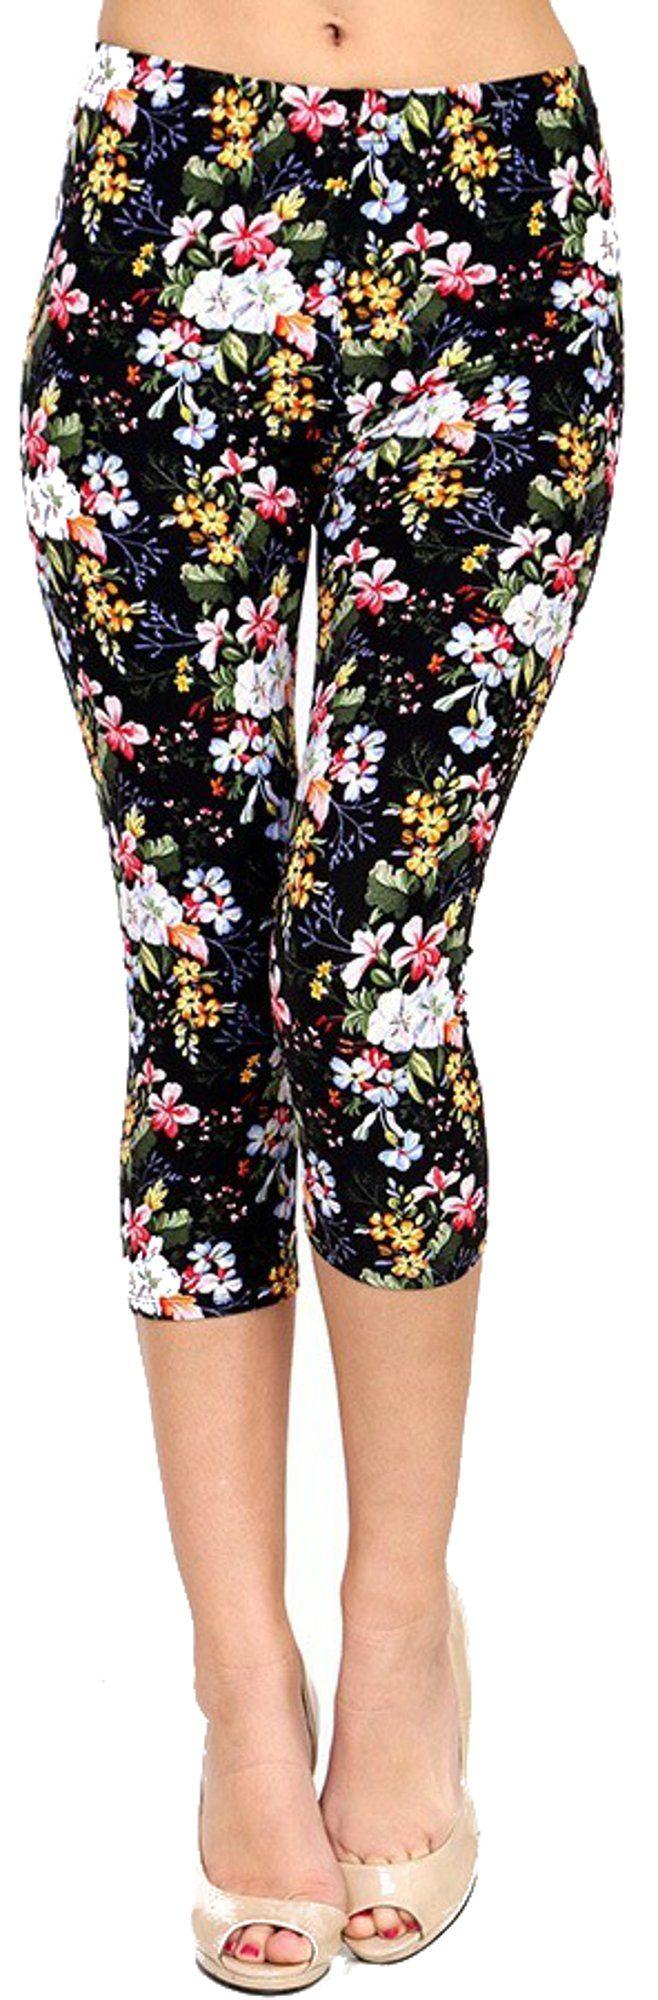 Lush Moda Extra Soft Capri Leggings - Variety of Prints - Field Bouquet Capri